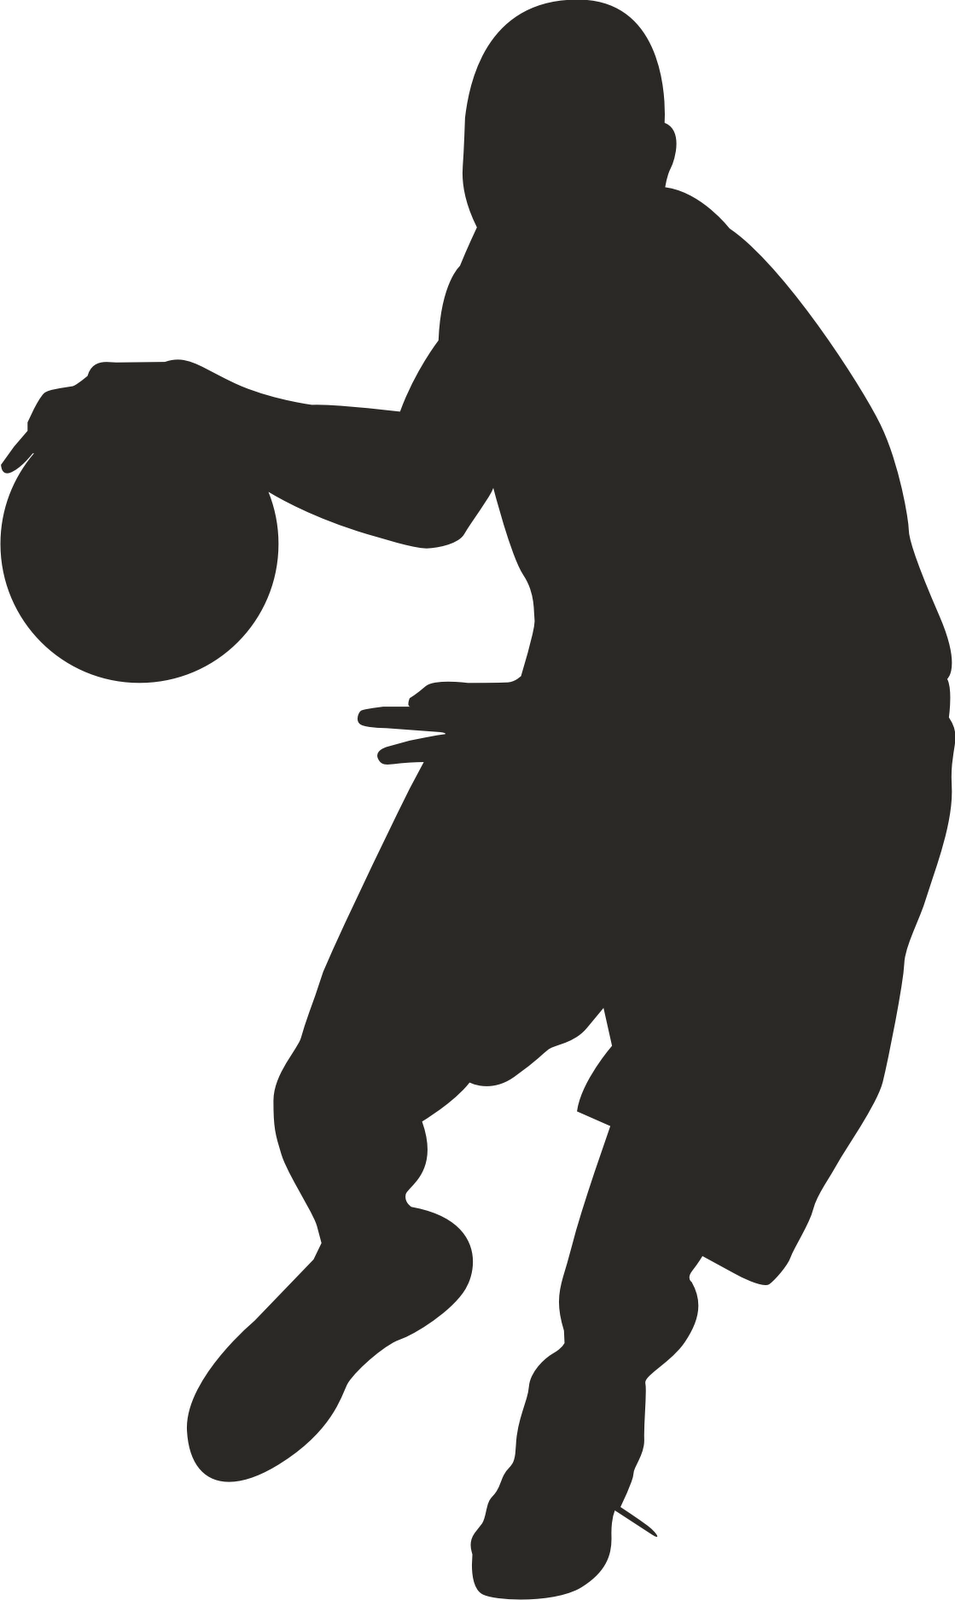 nba logo silhouette at getdrawings com free for personal use nba rh getdrawings com baseball logos clip art free baseball logos clip art of a chief